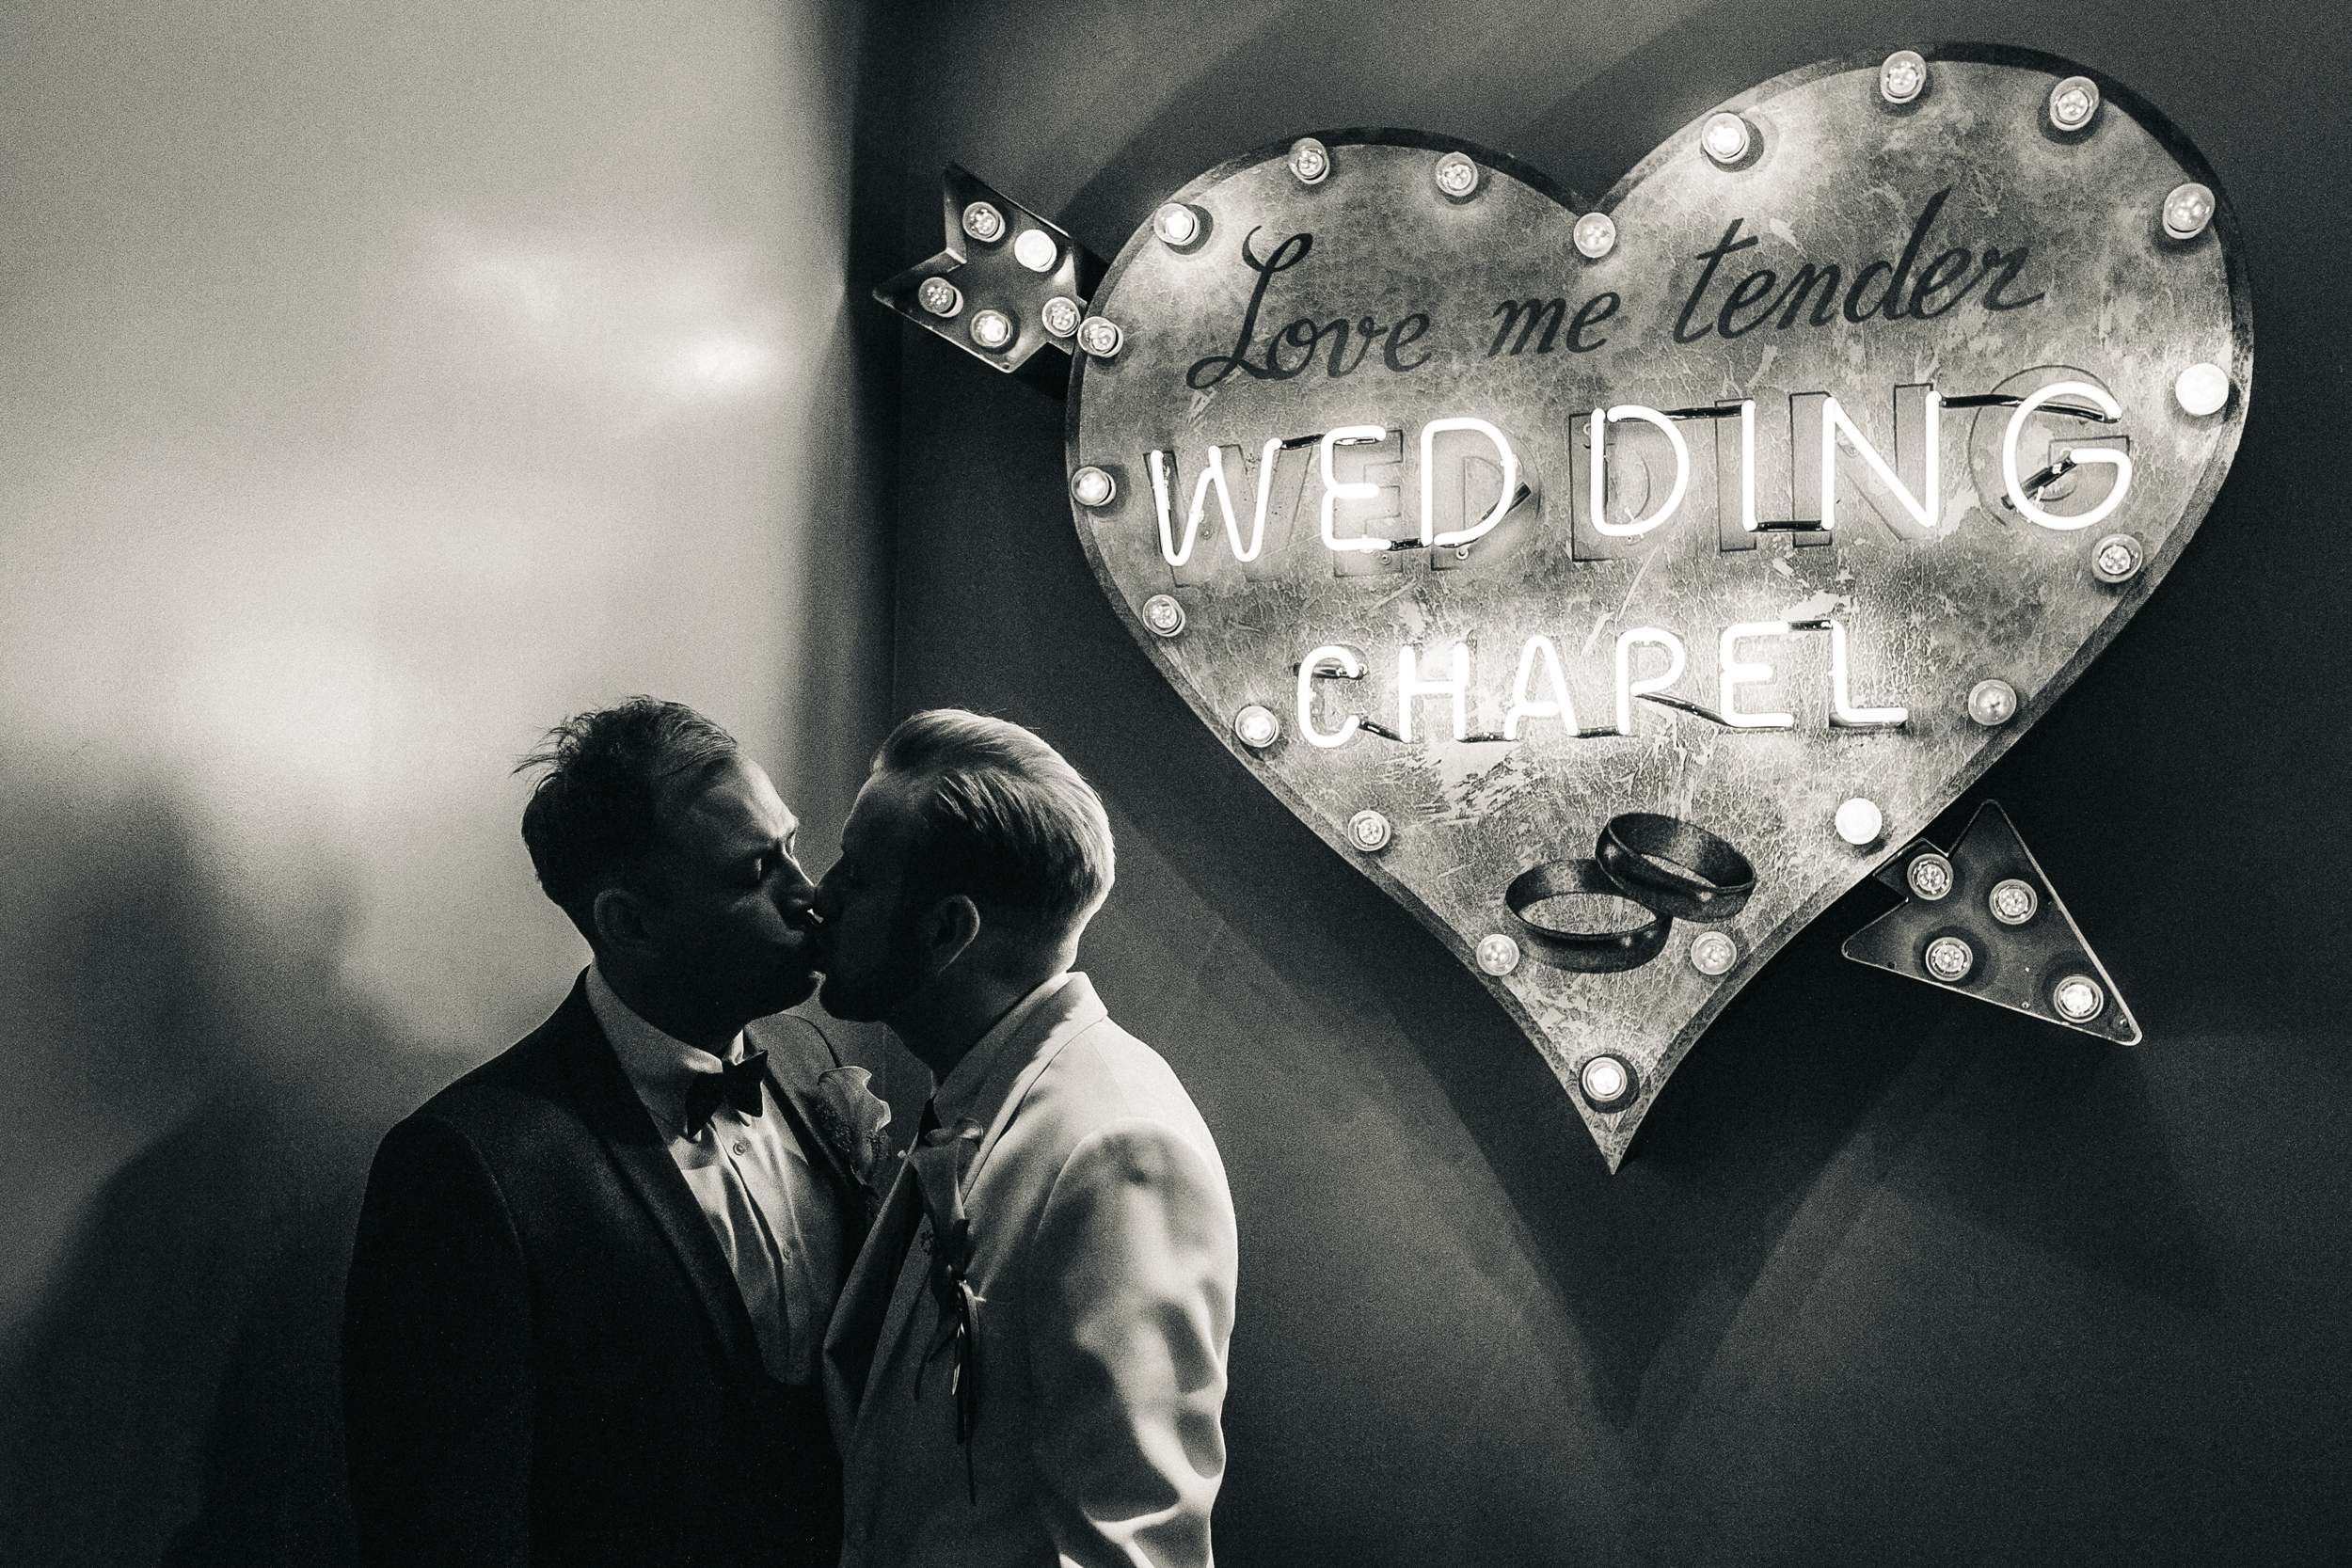 creative-wedding-photography-teesside-north-east-yorkshire-4.jpg